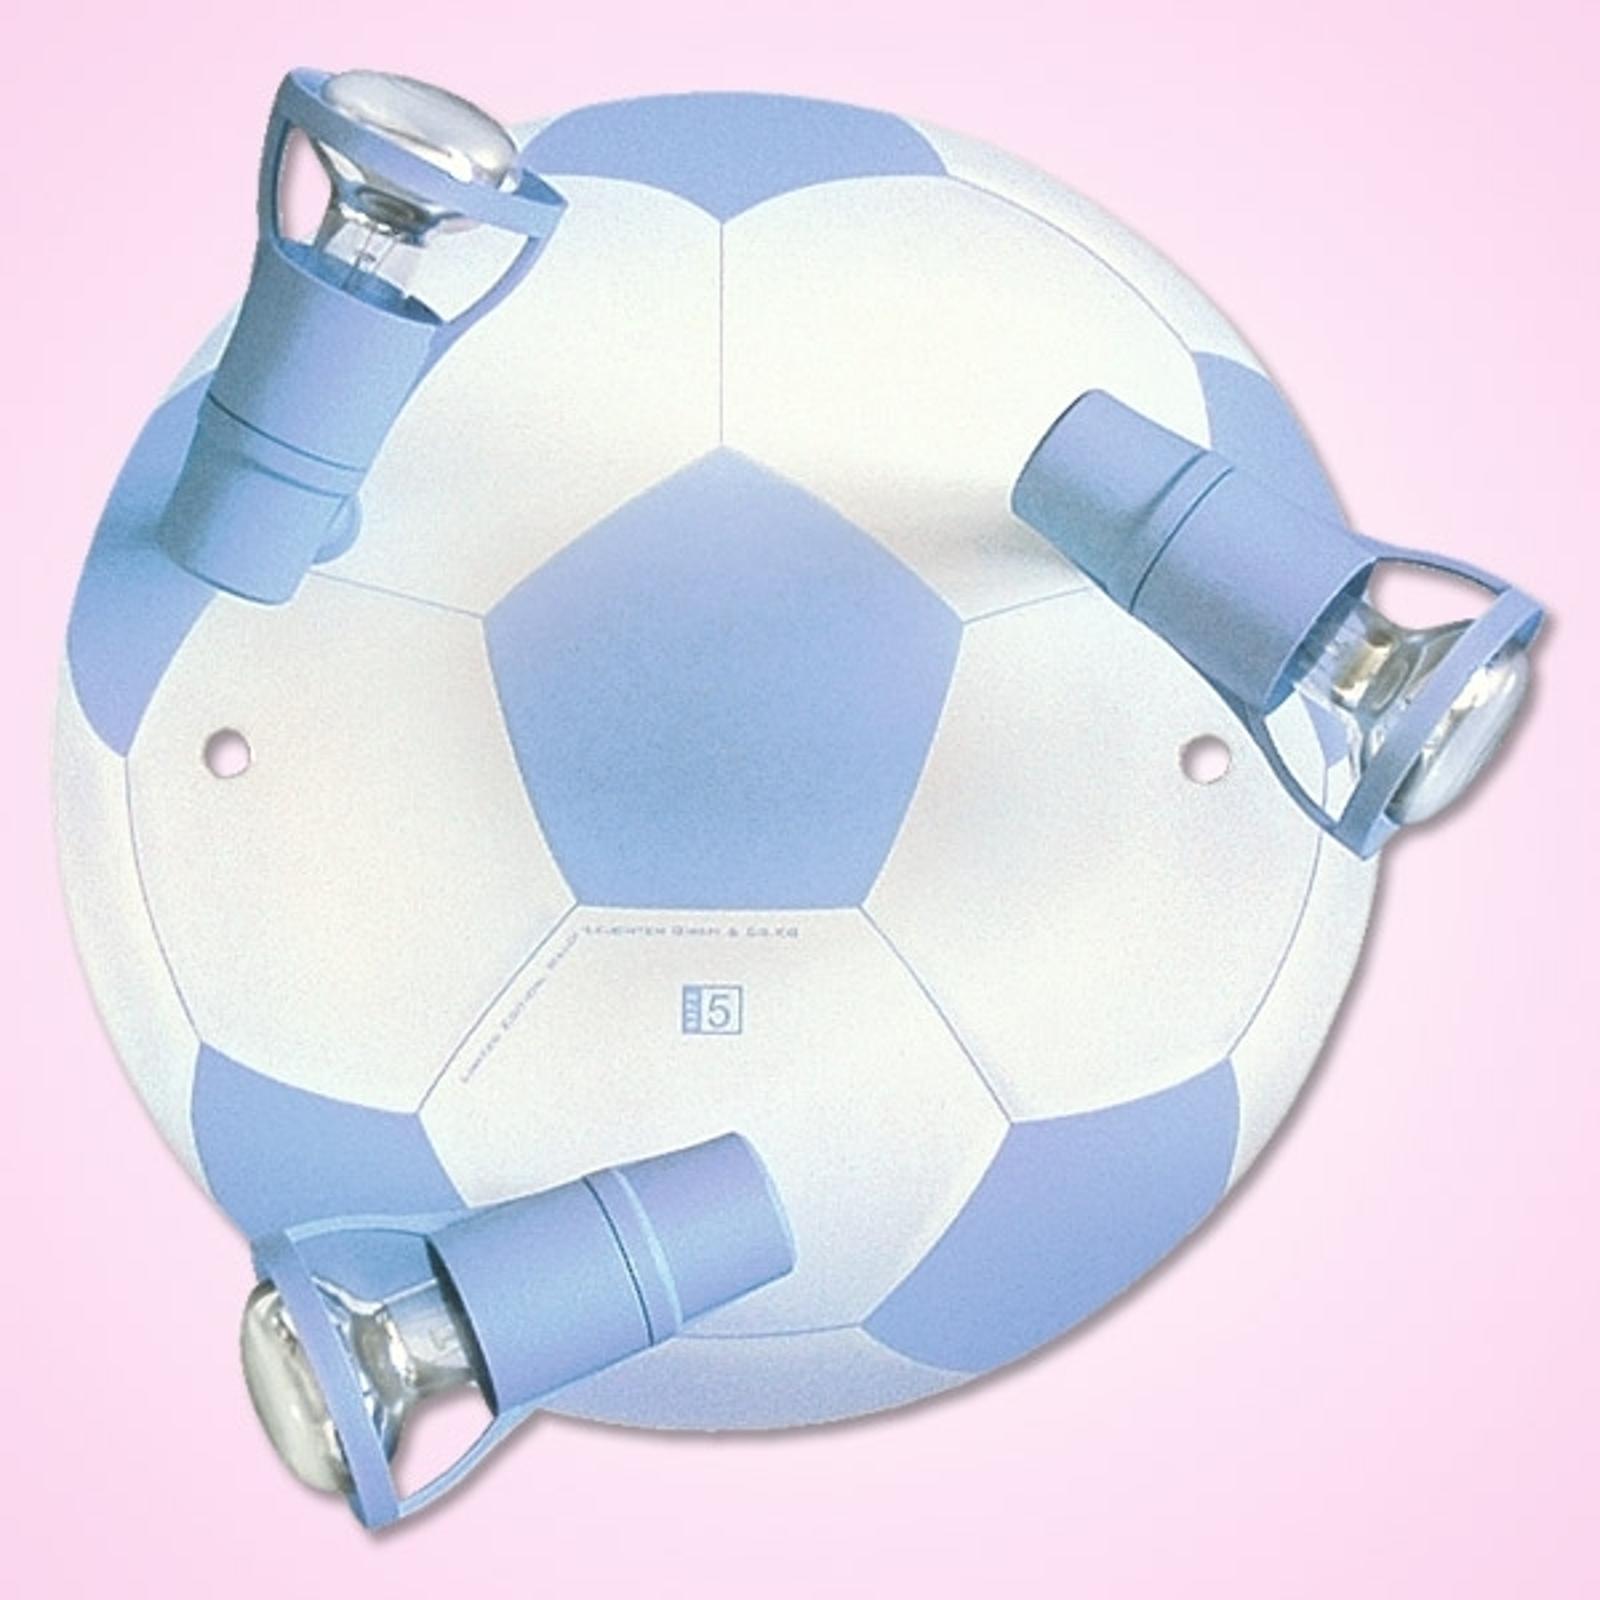 FUSSBALL - plafonnier bleu clair 3 lampes